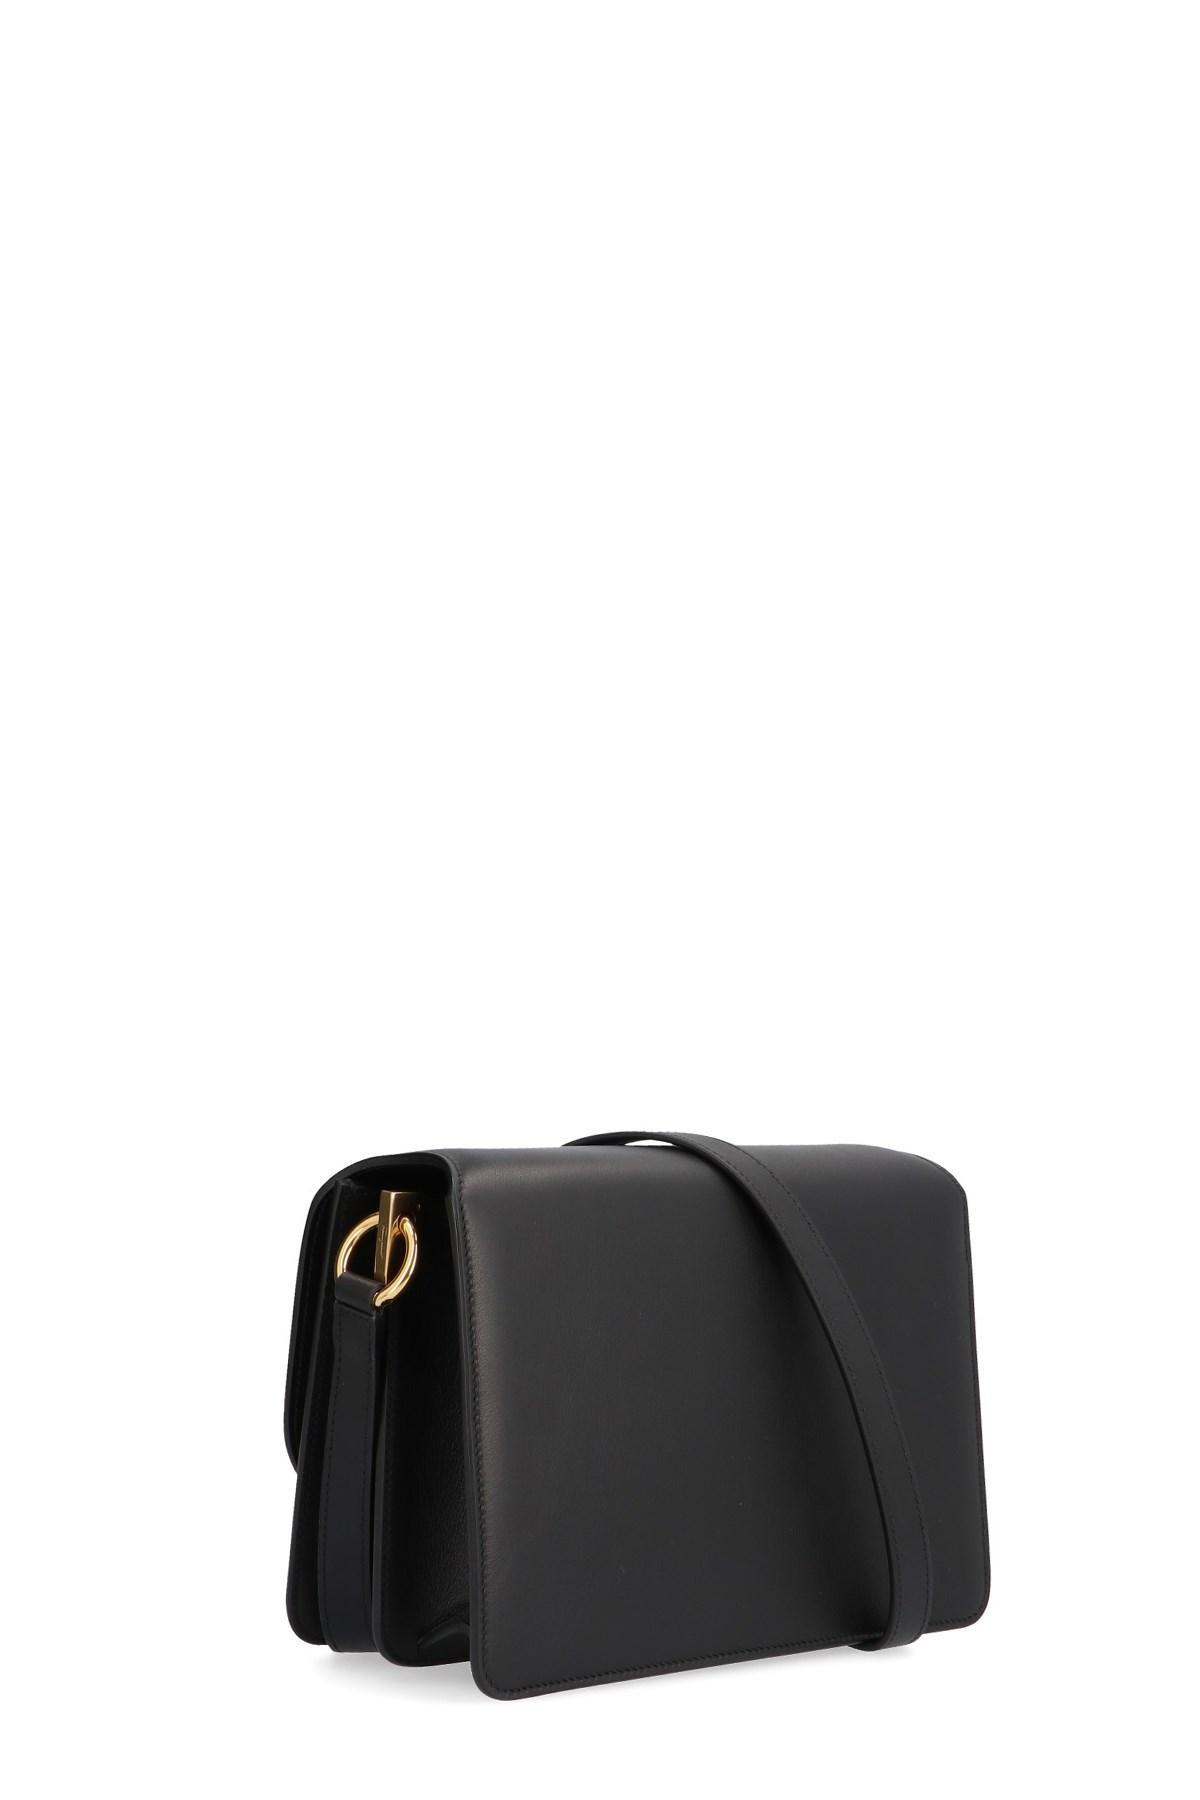 Lyst - Ferragamo  joanne  Crossbody Bag in Black 9194438ac4775